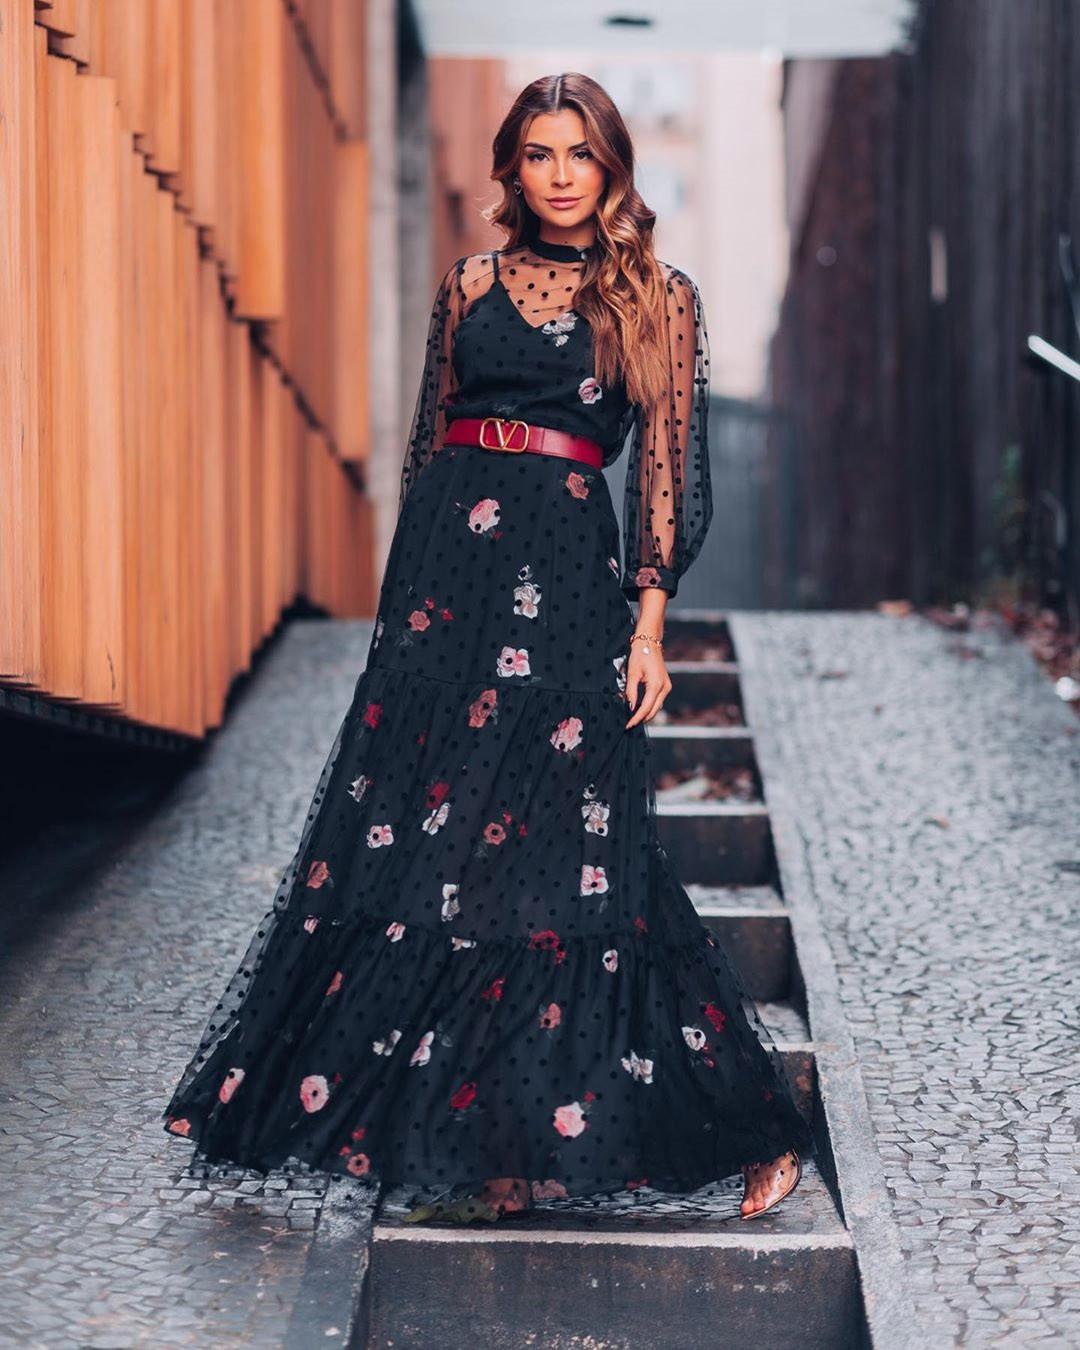 Vestido Longo Floral Tule Poá Preto Ariane Moda Festa Poema Hit